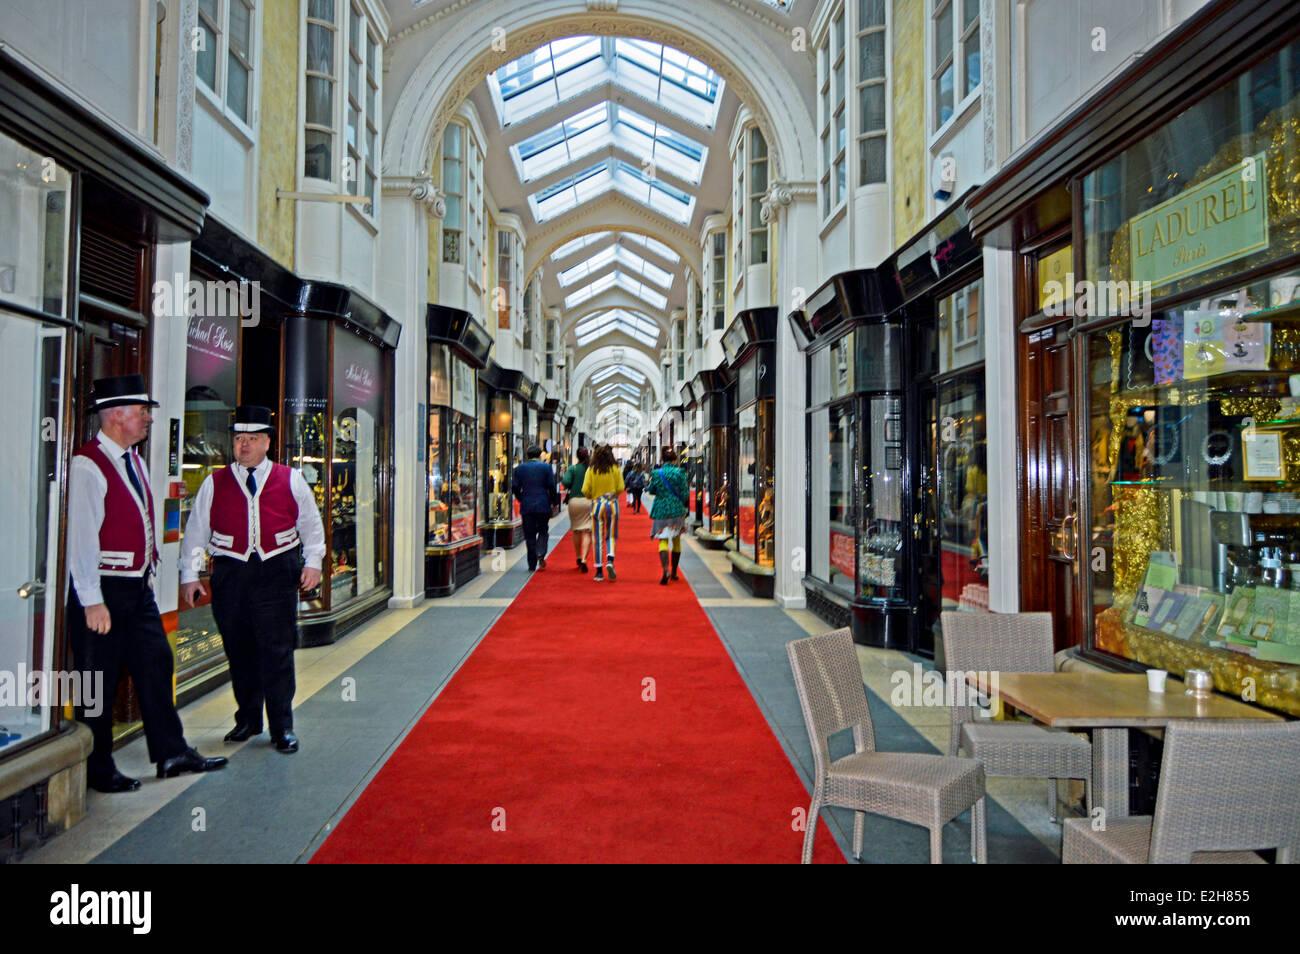 Burlington Arcade Beadles in traditional uniforms wearing top hats, Burlington Arcade, Mayfair, London, England, - Stock Image